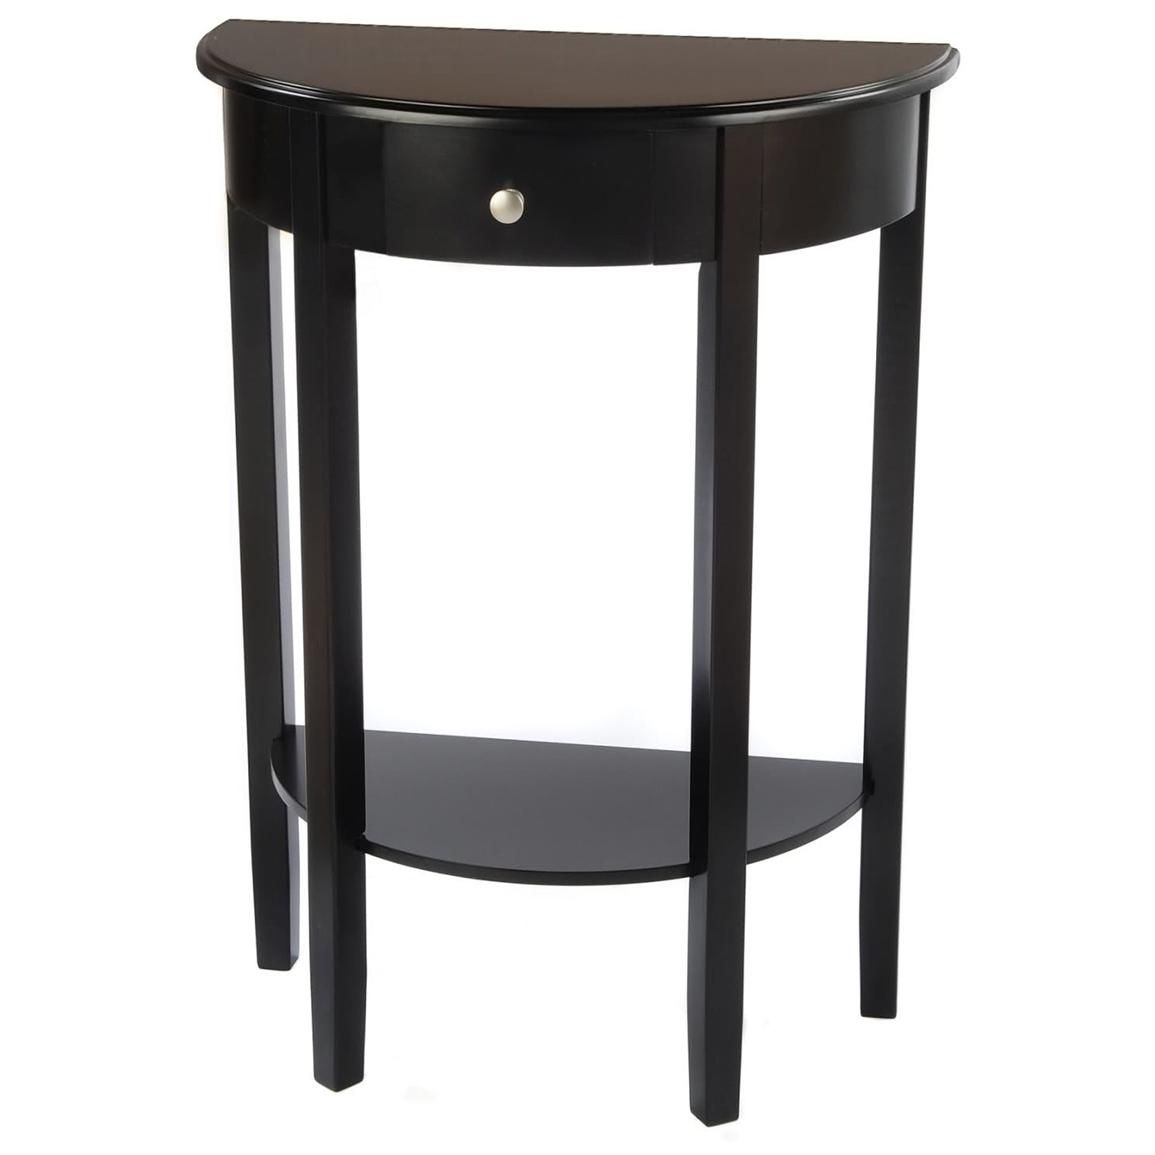 Small Half Moon Table For Hall Modern Wood Furniture Check More